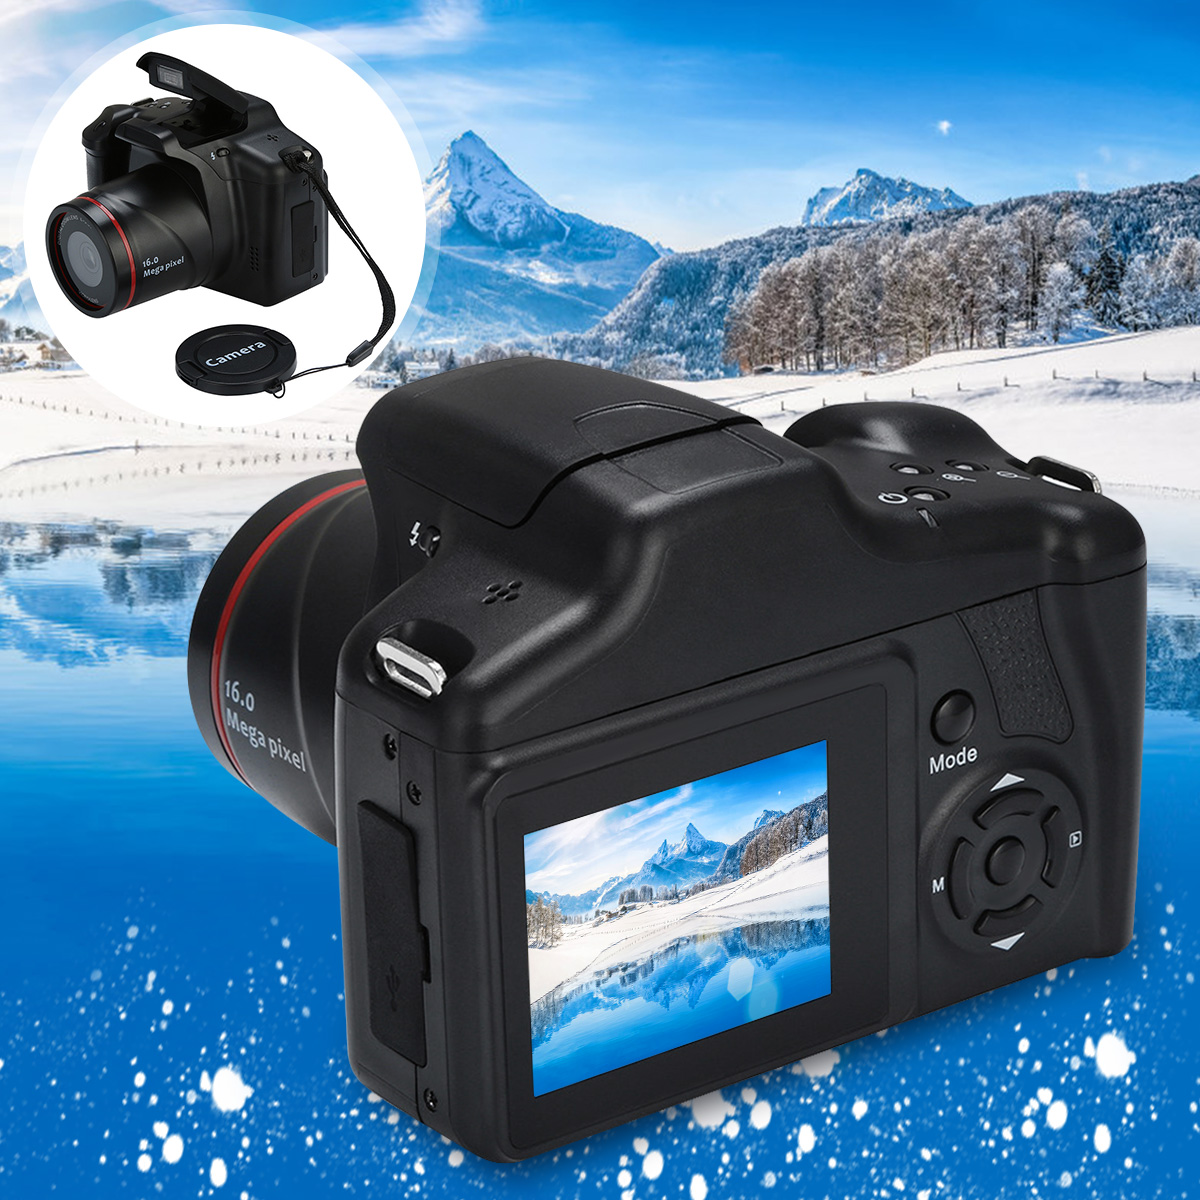 16X Zoom 16MP 1080P 2.4 Inch TFT Screen Anti-shake Digital SLR Camera with Builte CMOS Sensor Cameras Built-in Microphones